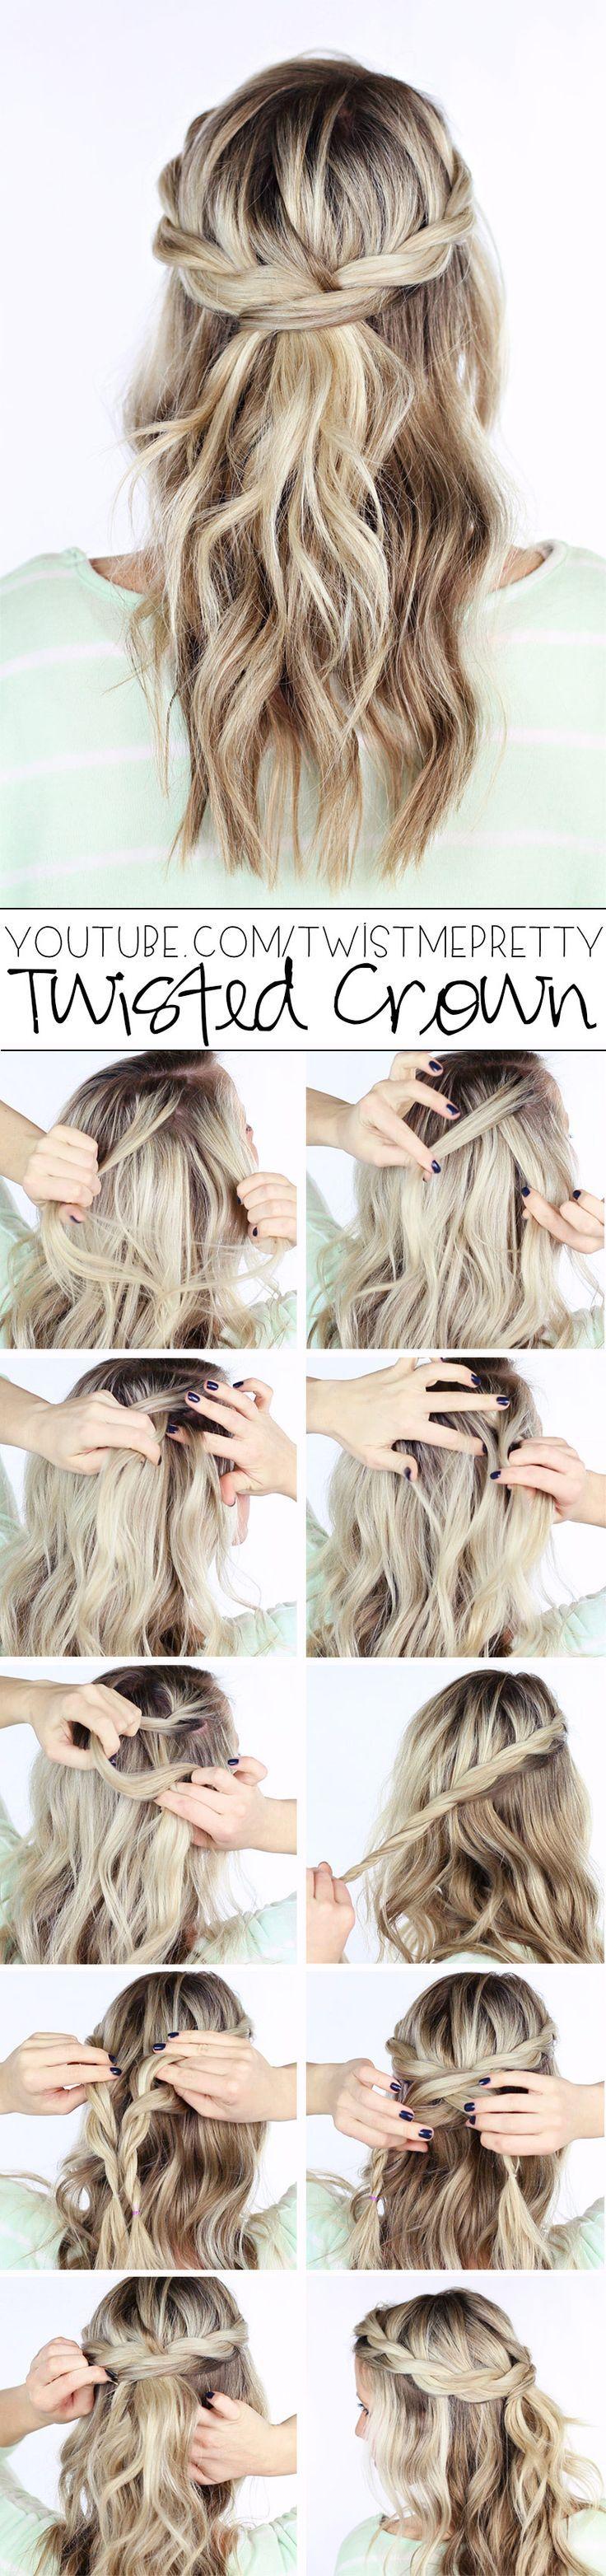 10 easy tutorials to make wedding hair | hair & beauty